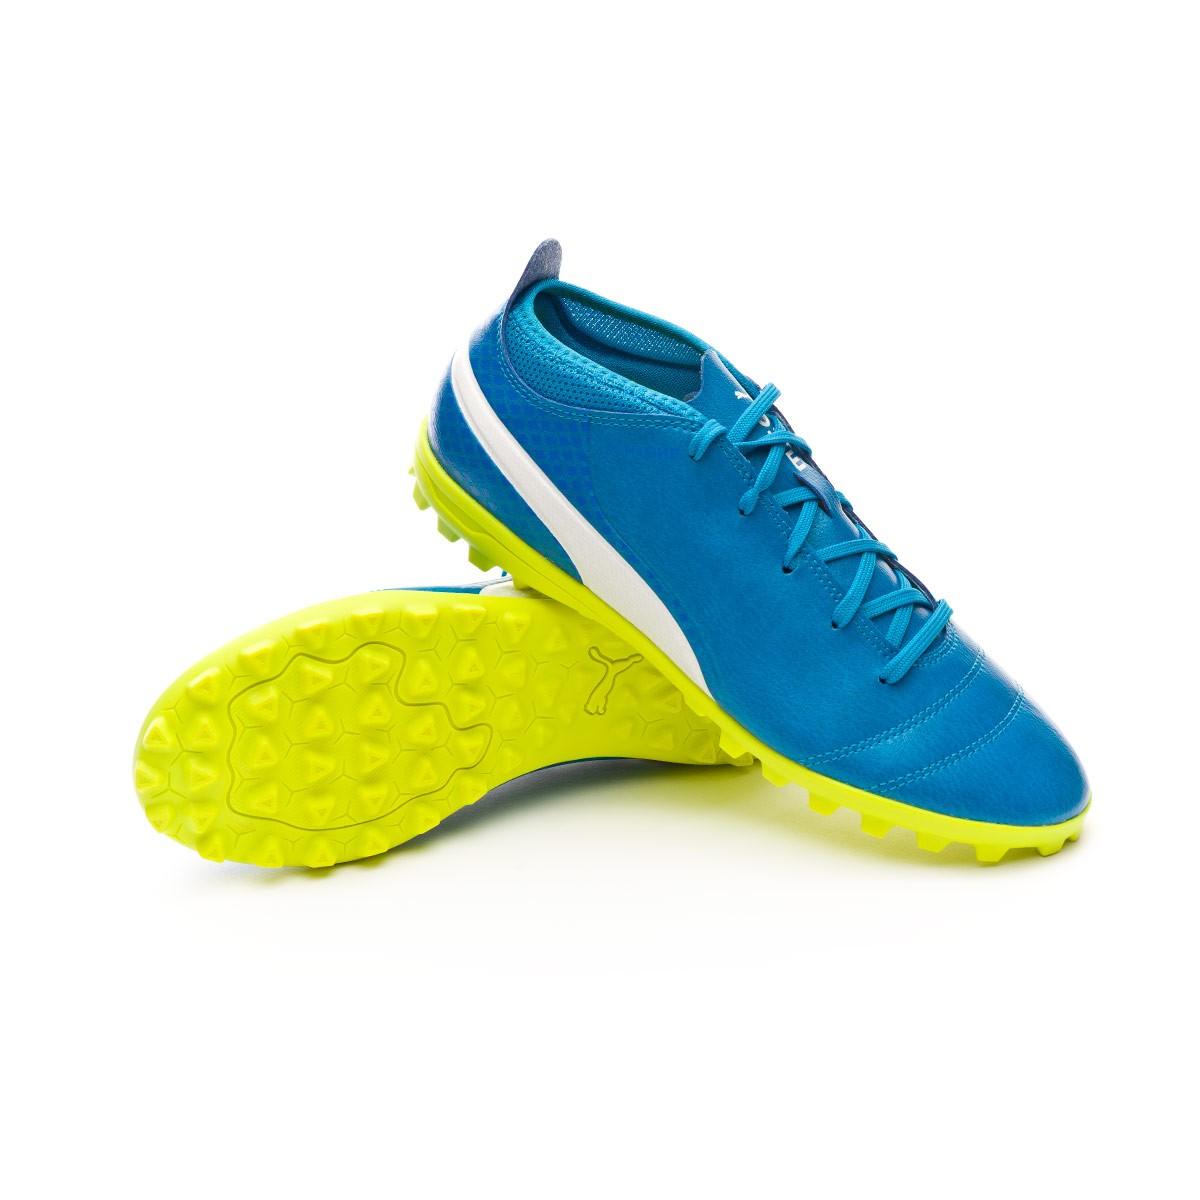 2a397358b Football Boot Puma Kids ONE 17.4 TT Atomic blue-Puma white-Safety ...